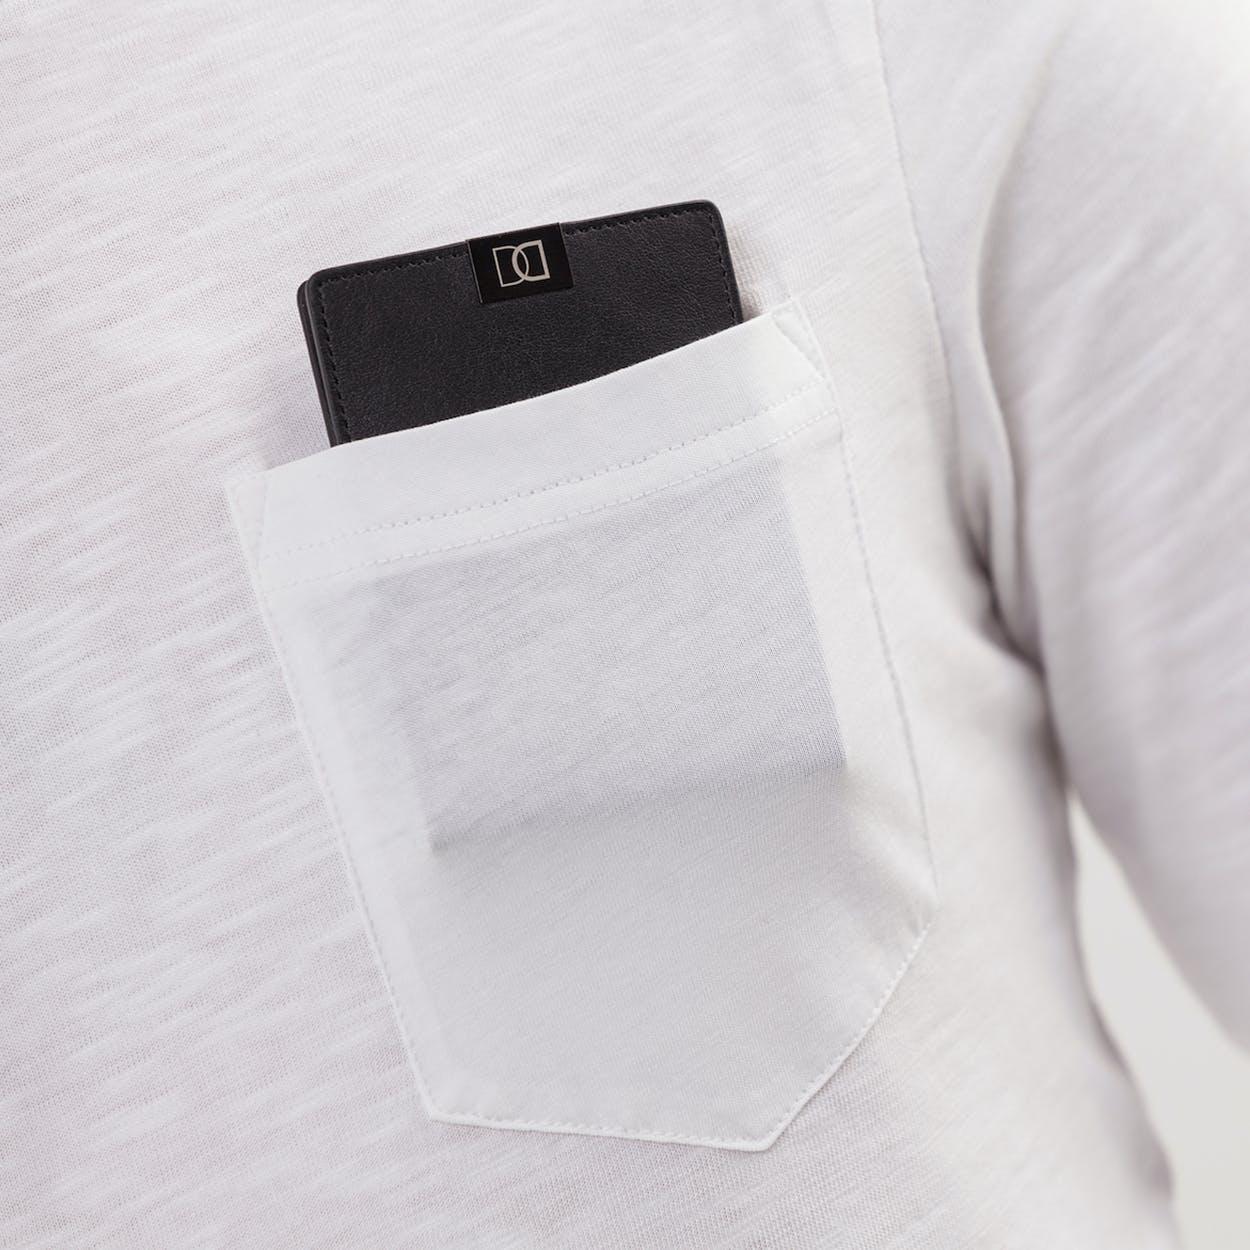 DUN // Black Edition RFID Wallet